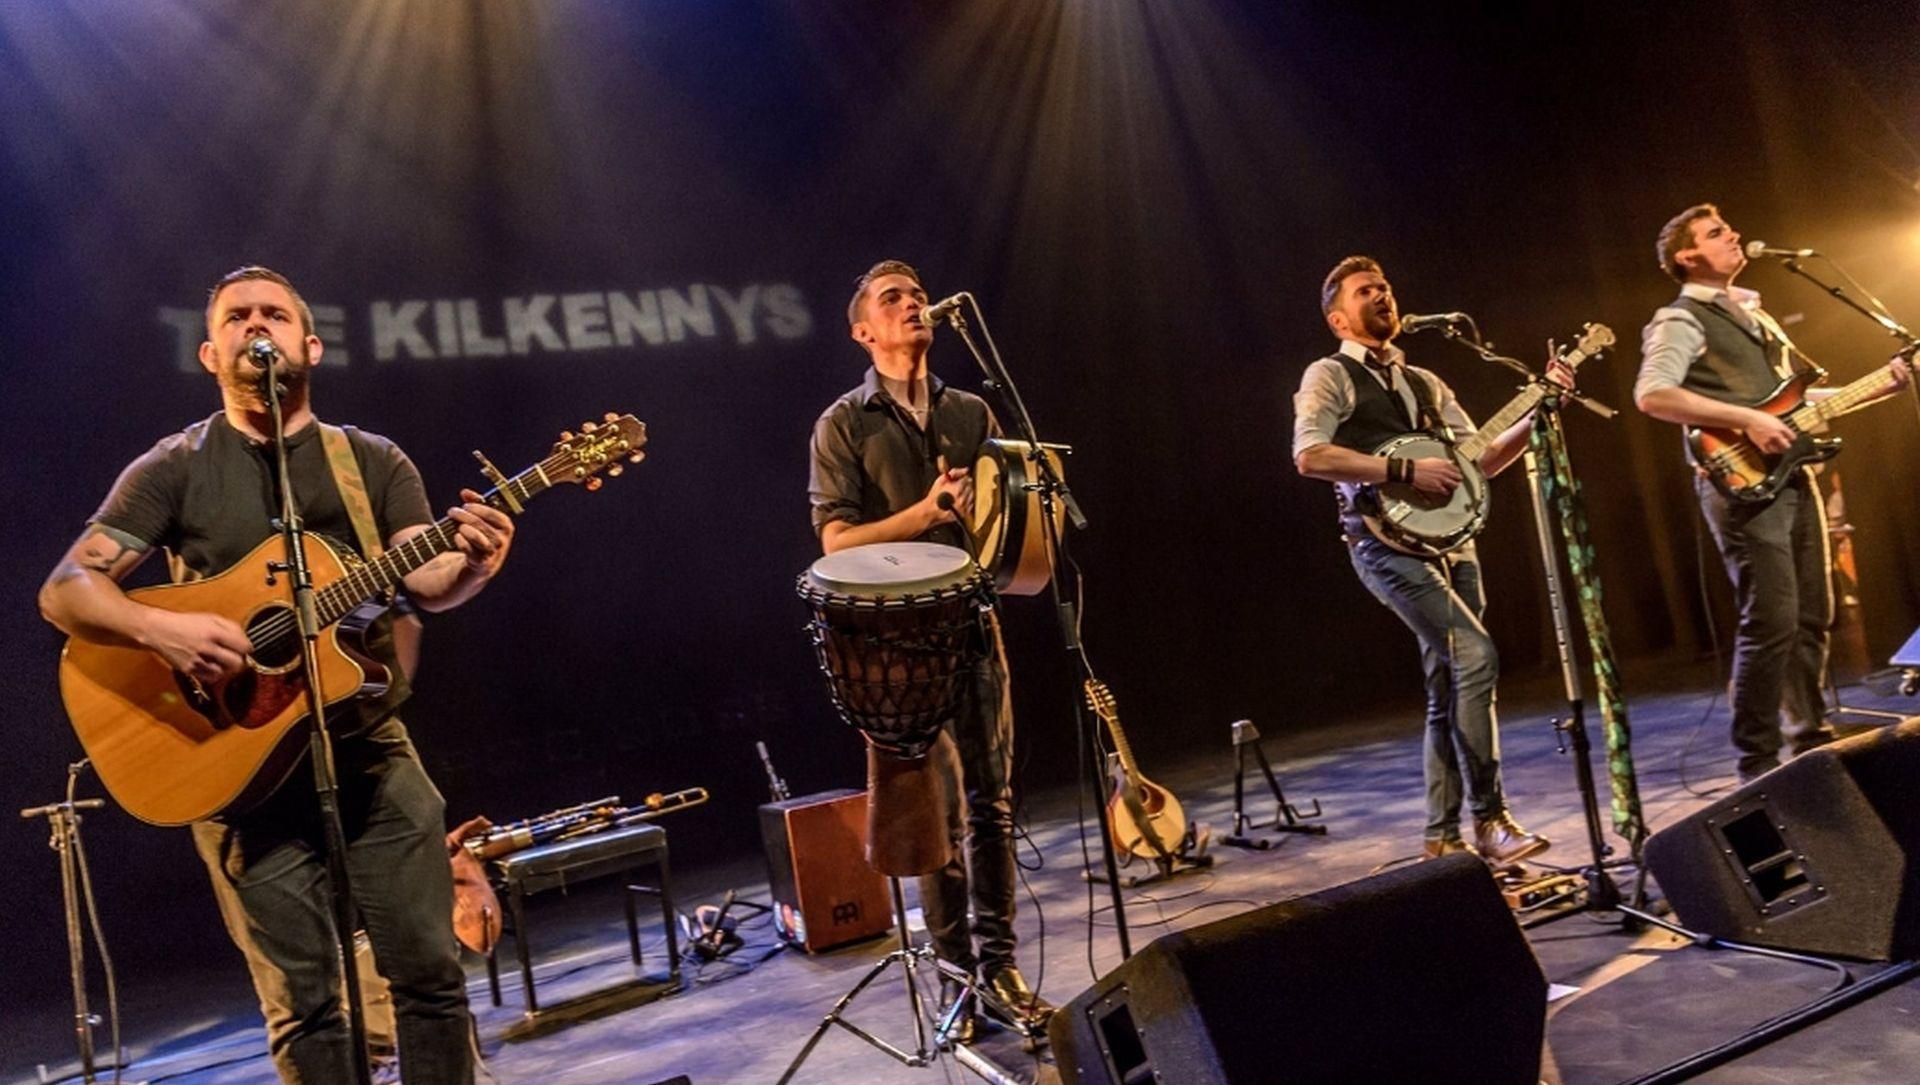 Irish folk muziek van de Ierse band The Kilkenny's